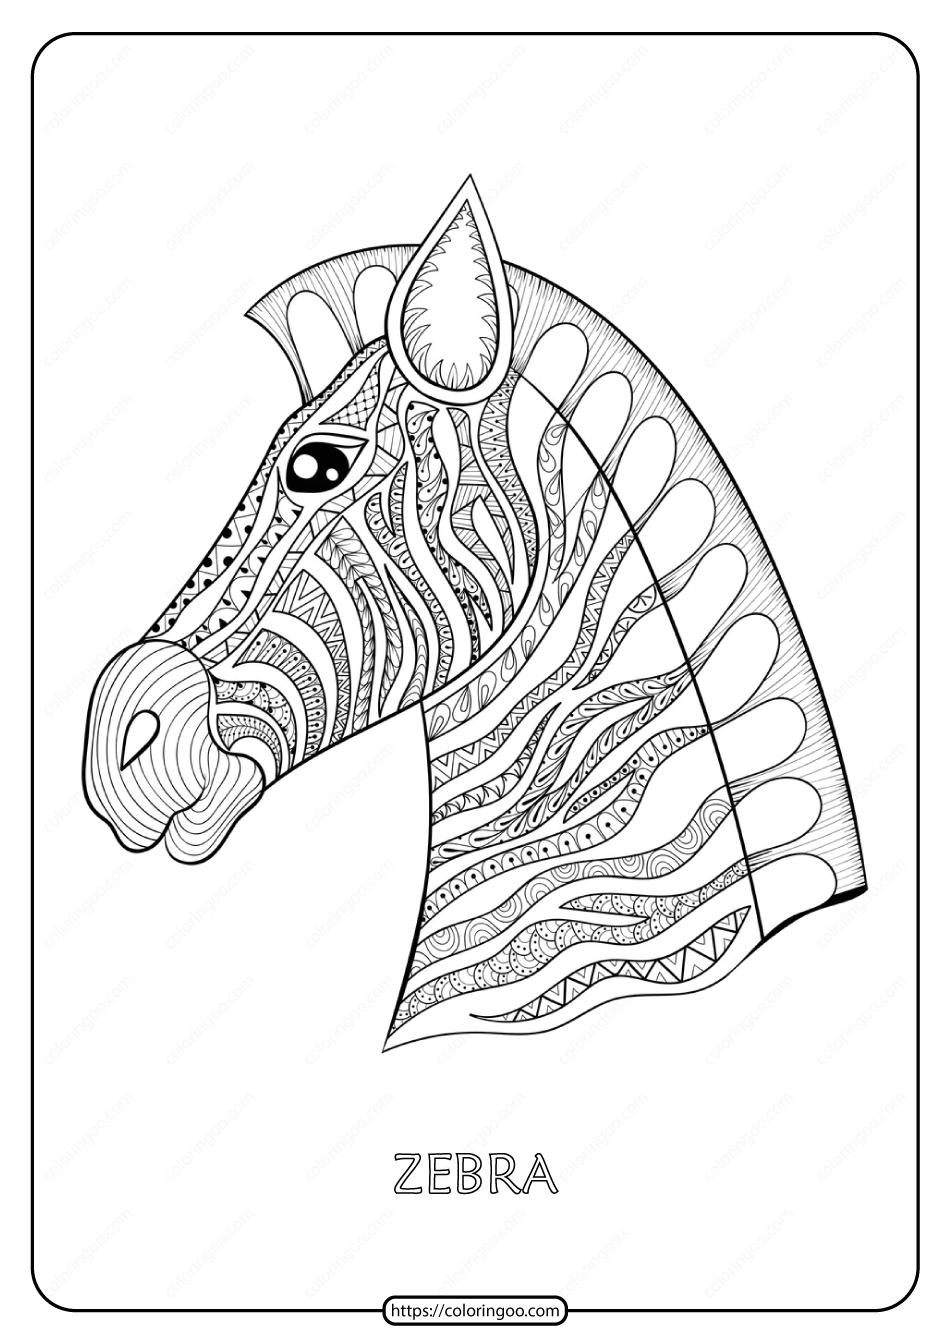 Free Printable Zebra Mandala Coloring Page Mandala Coloring Pages Mandala Coloring Coloring Pages